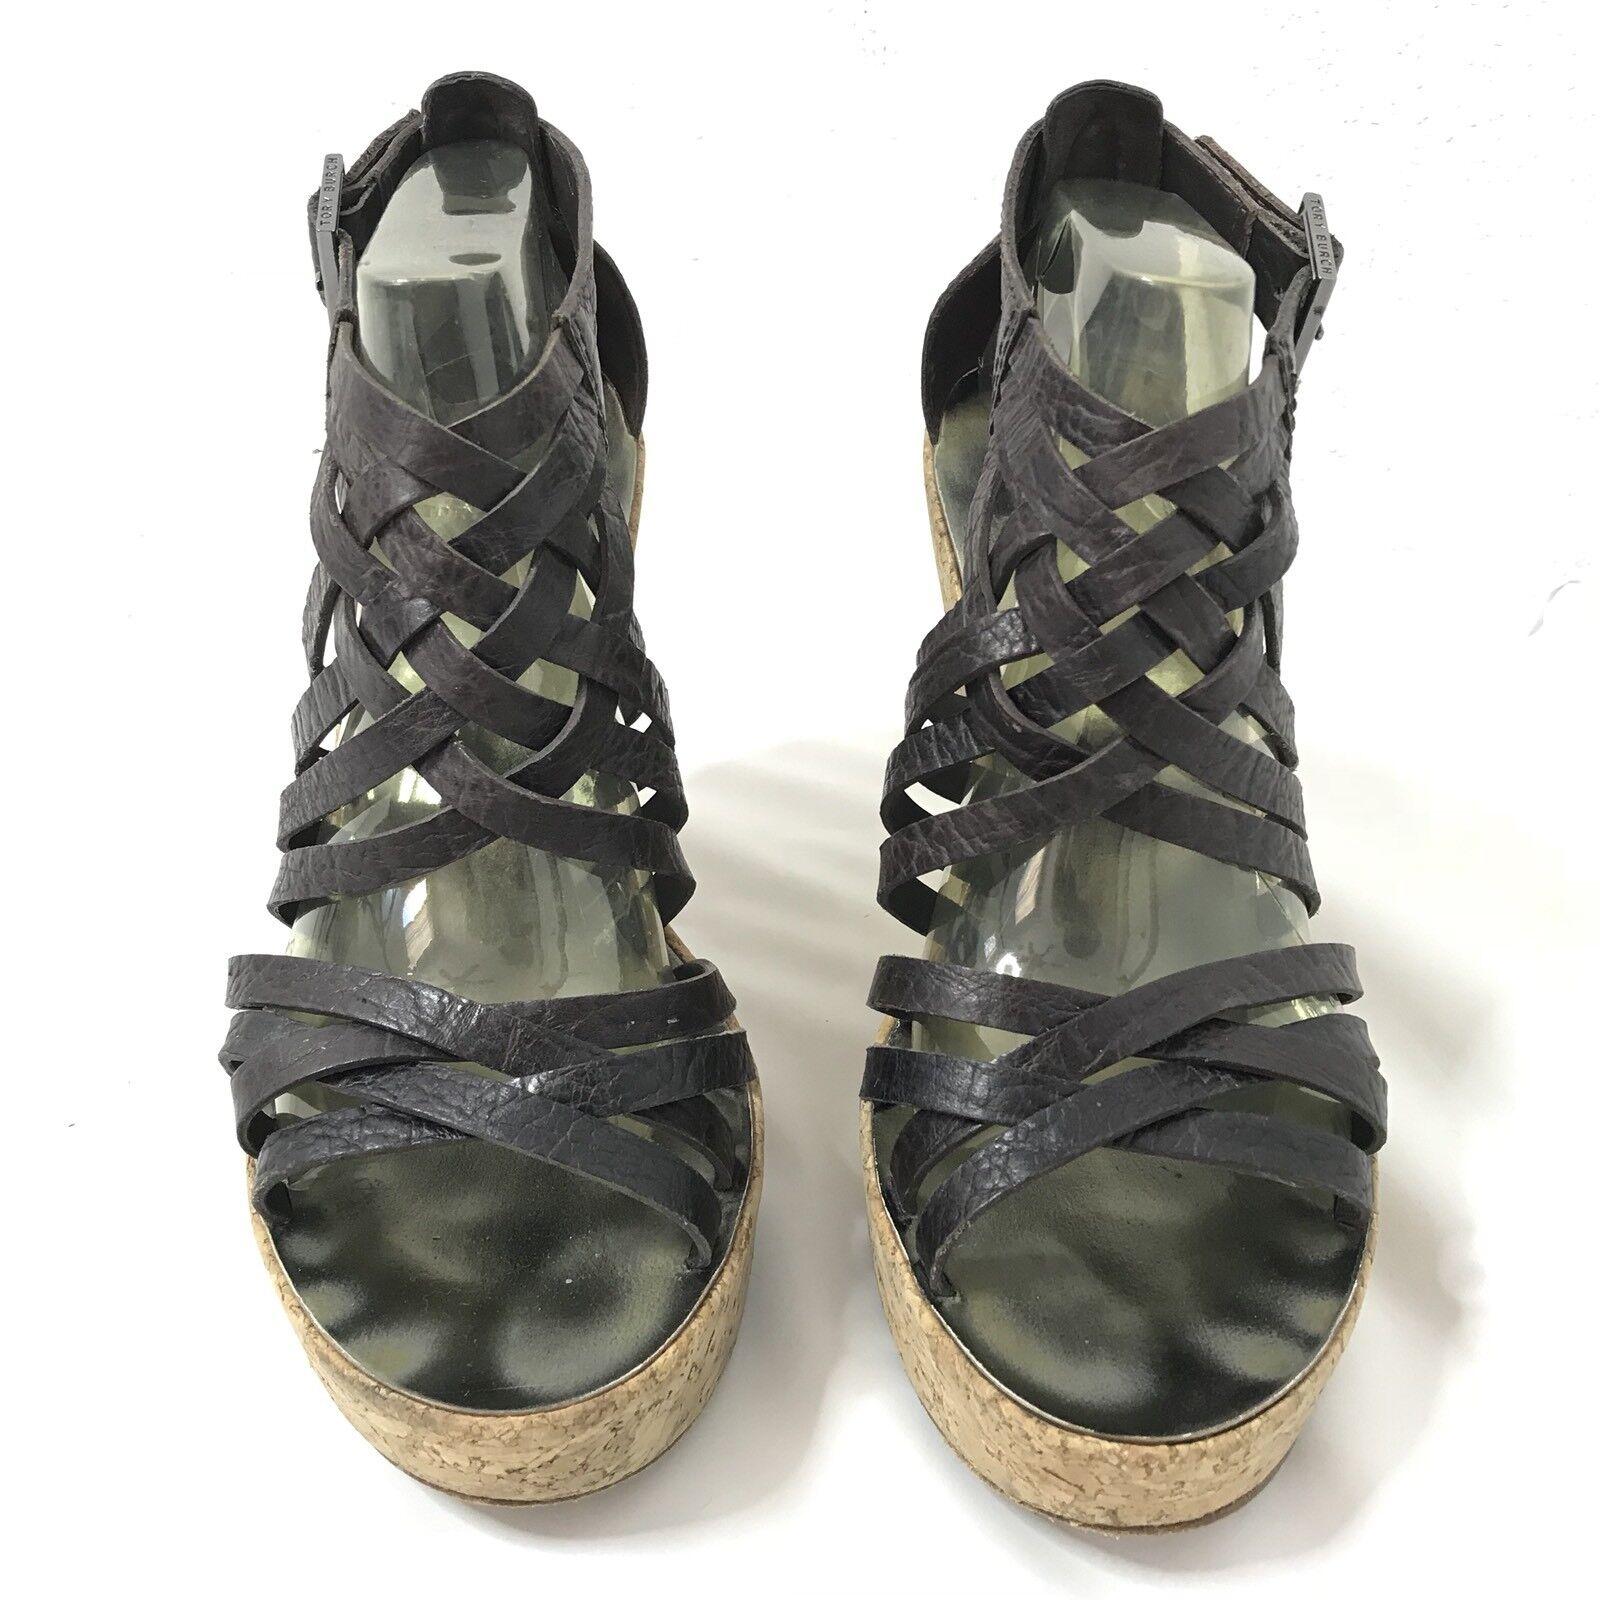 Tory Burch Cork Wedges Platform Heel Leather Cross Strap Women's Women's Women's 9.5 451d72